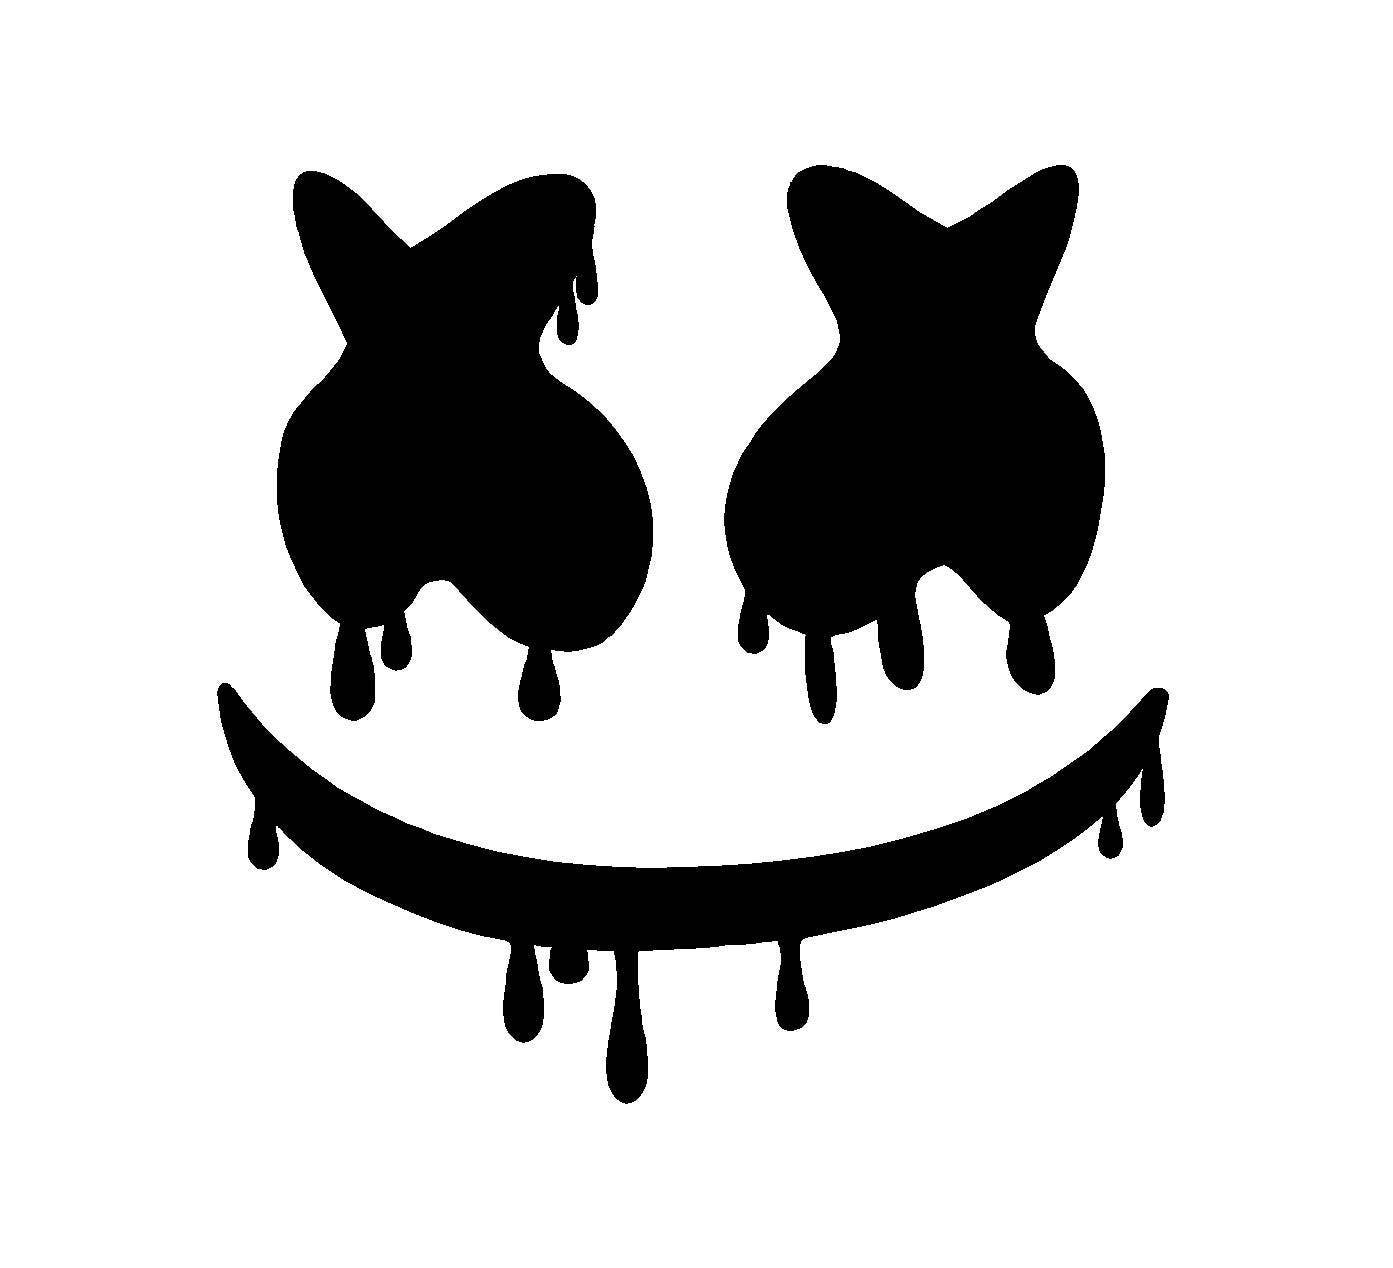 Dripping marshmello edm dj vinyl decal car laptop sticker zoom stopboris Images